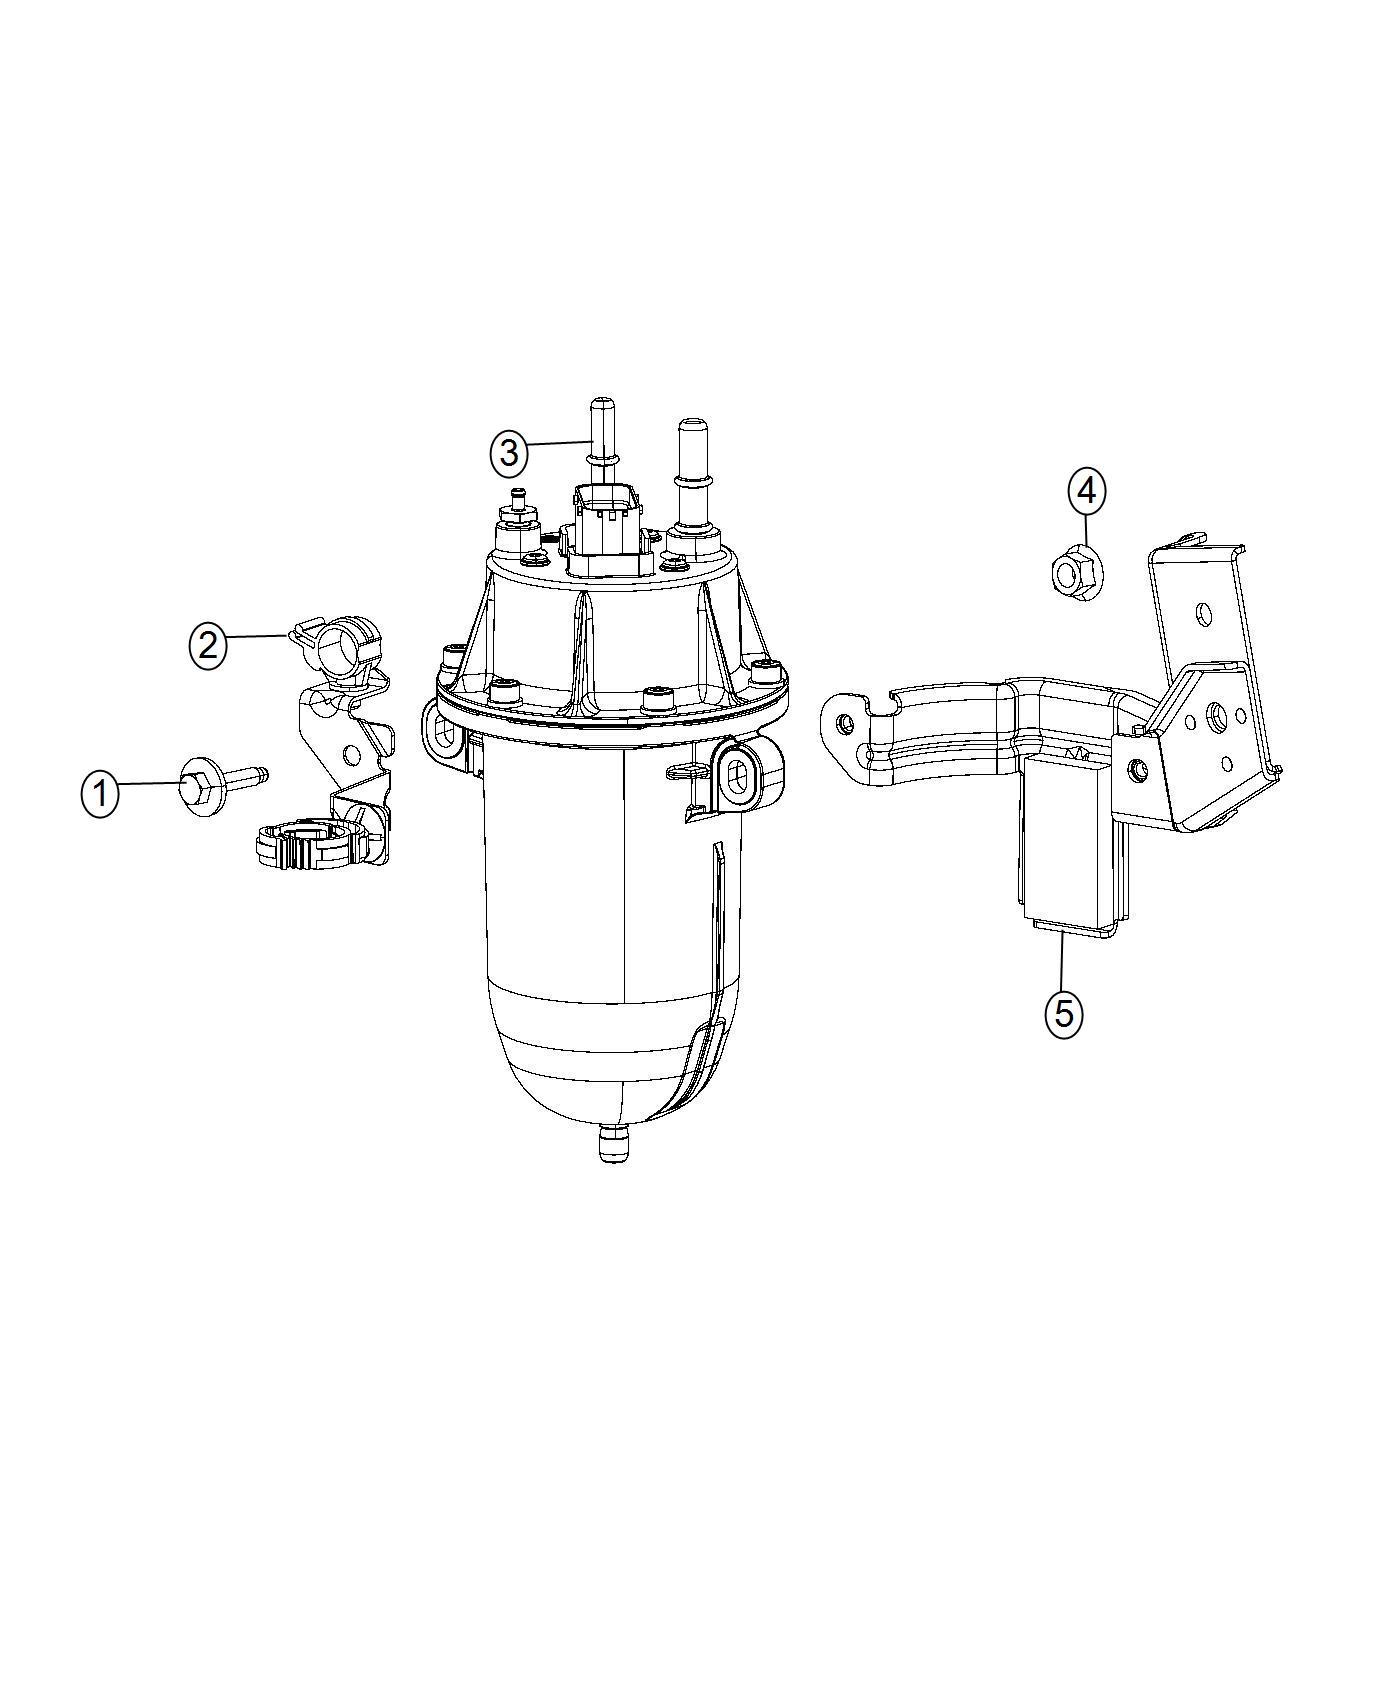 2016 Dodge Ram 2500 Filter assy. Fuel. Maintenance